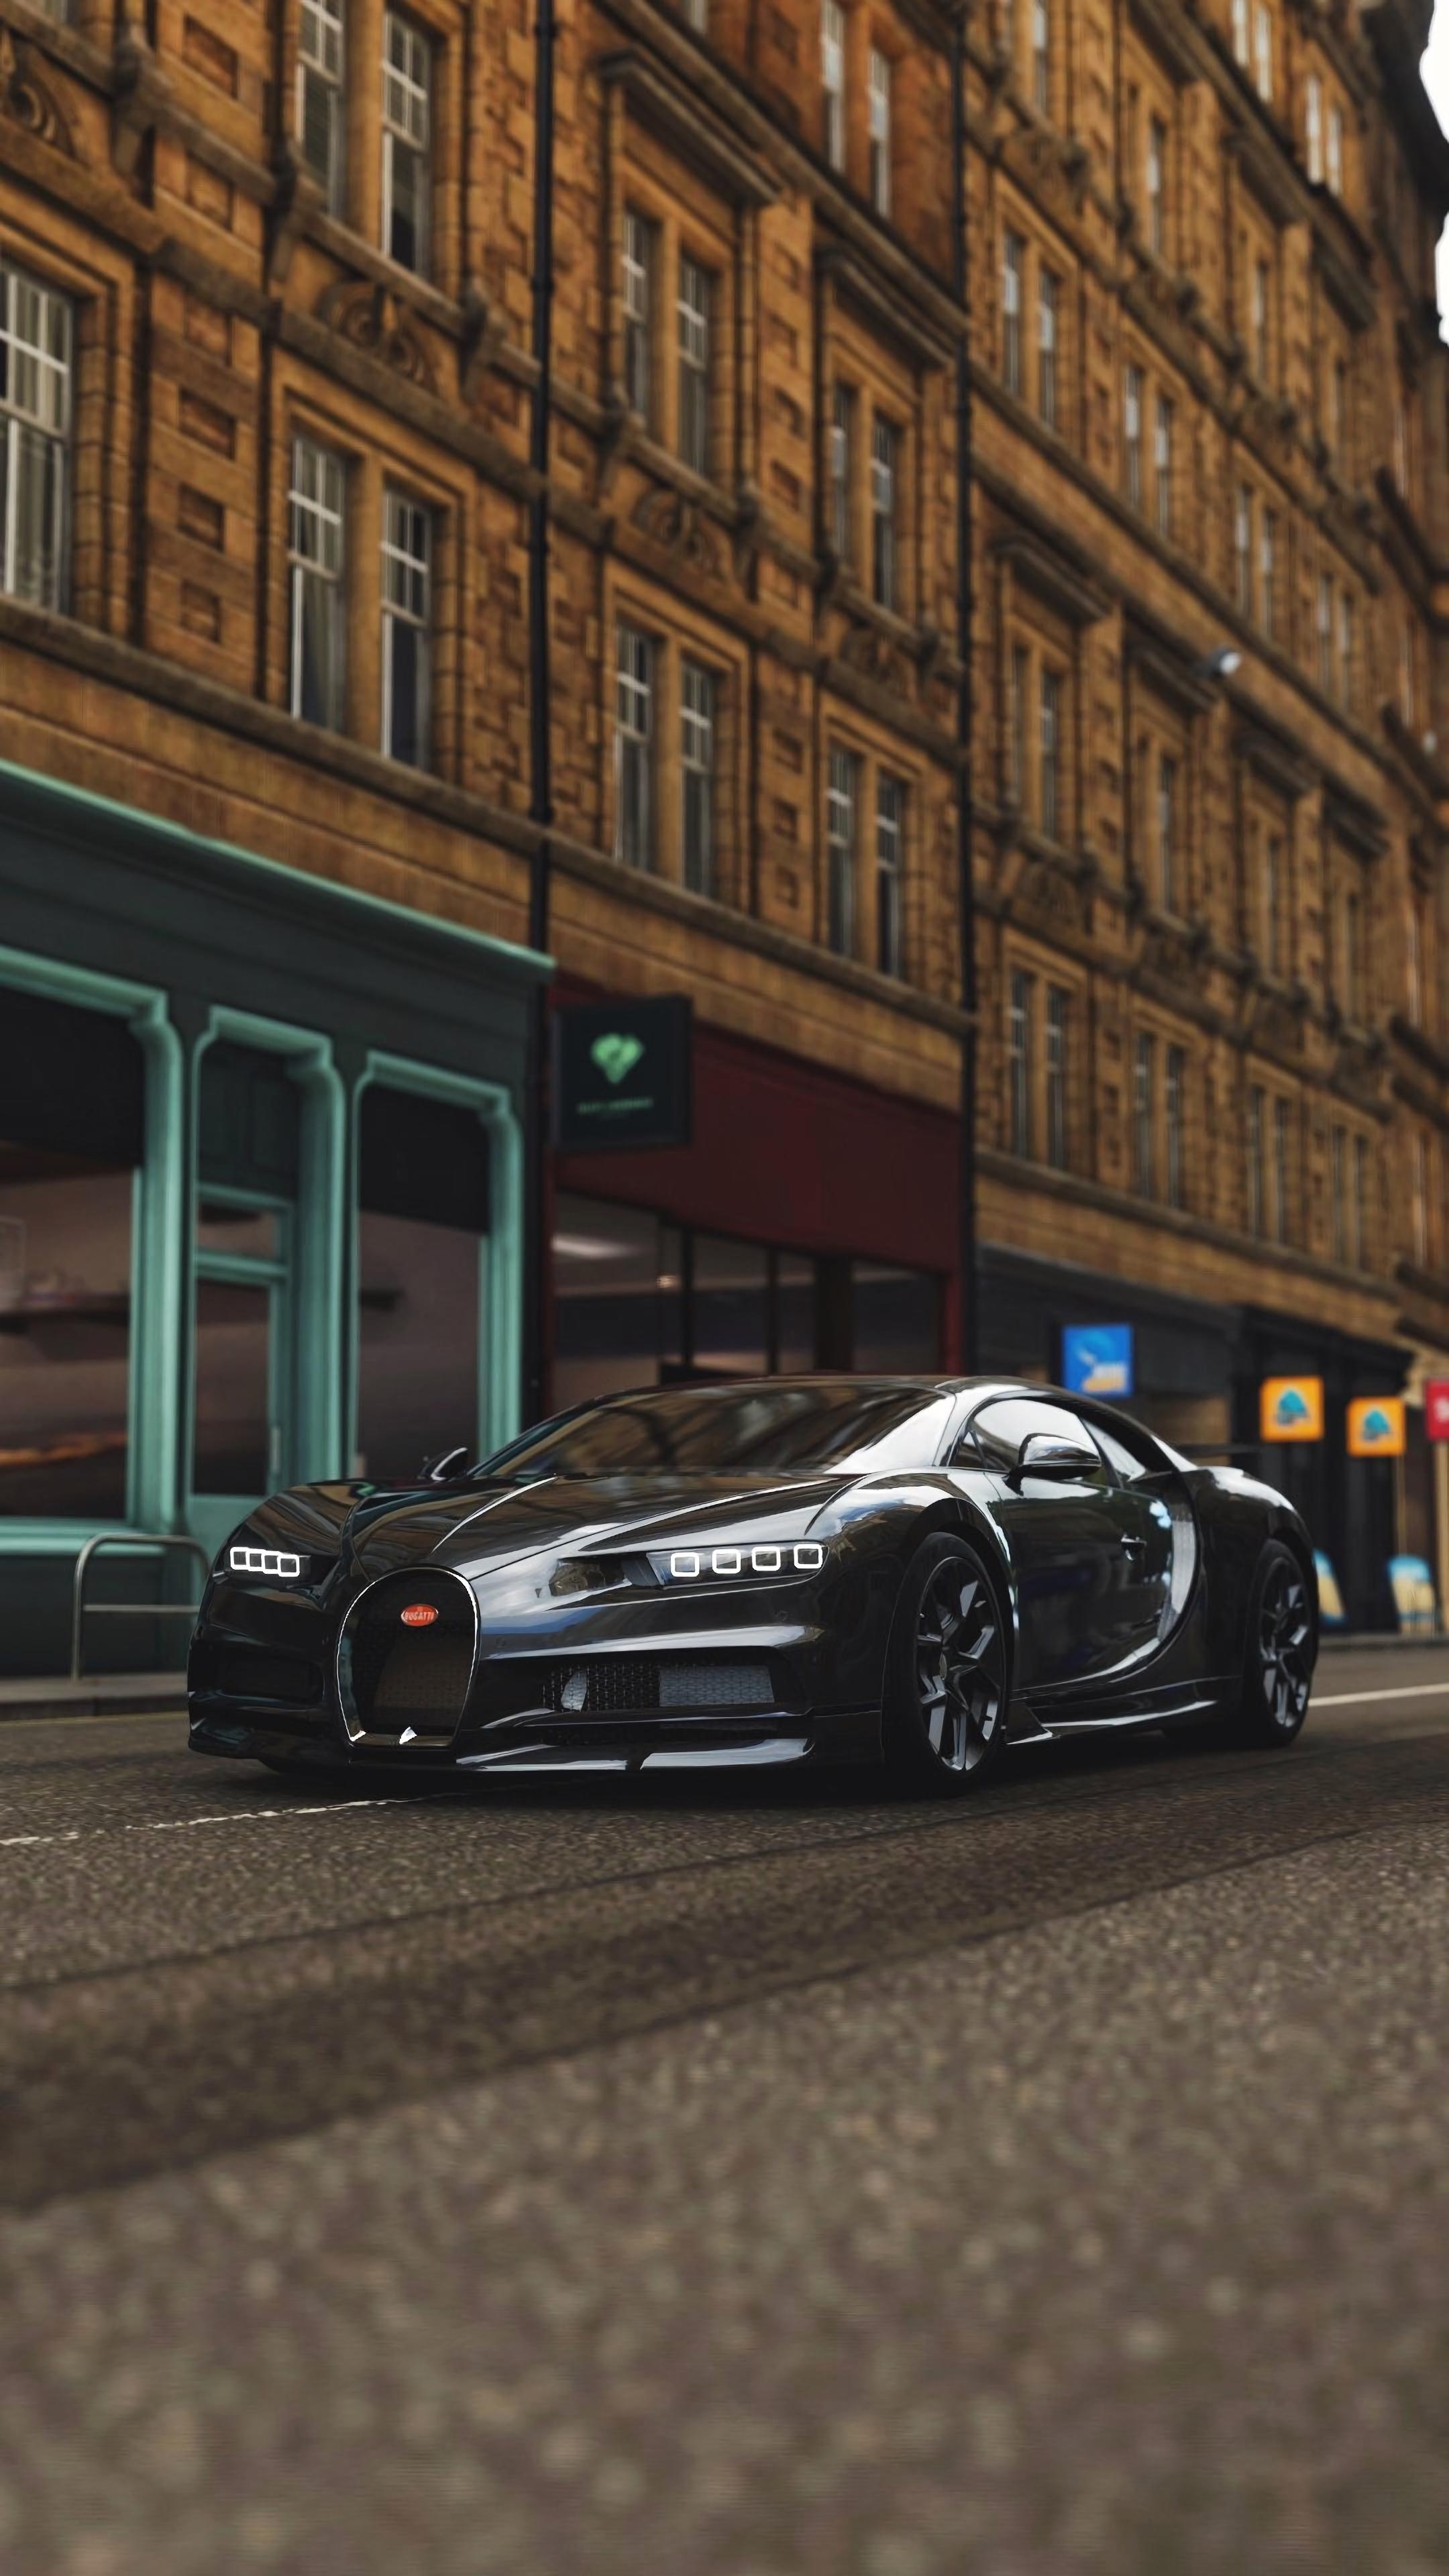 110836 download wallpaper Cars, Bugatti Chiron, Bugatti, Sports Car, Sports, Supercar screensavers and pictures for free